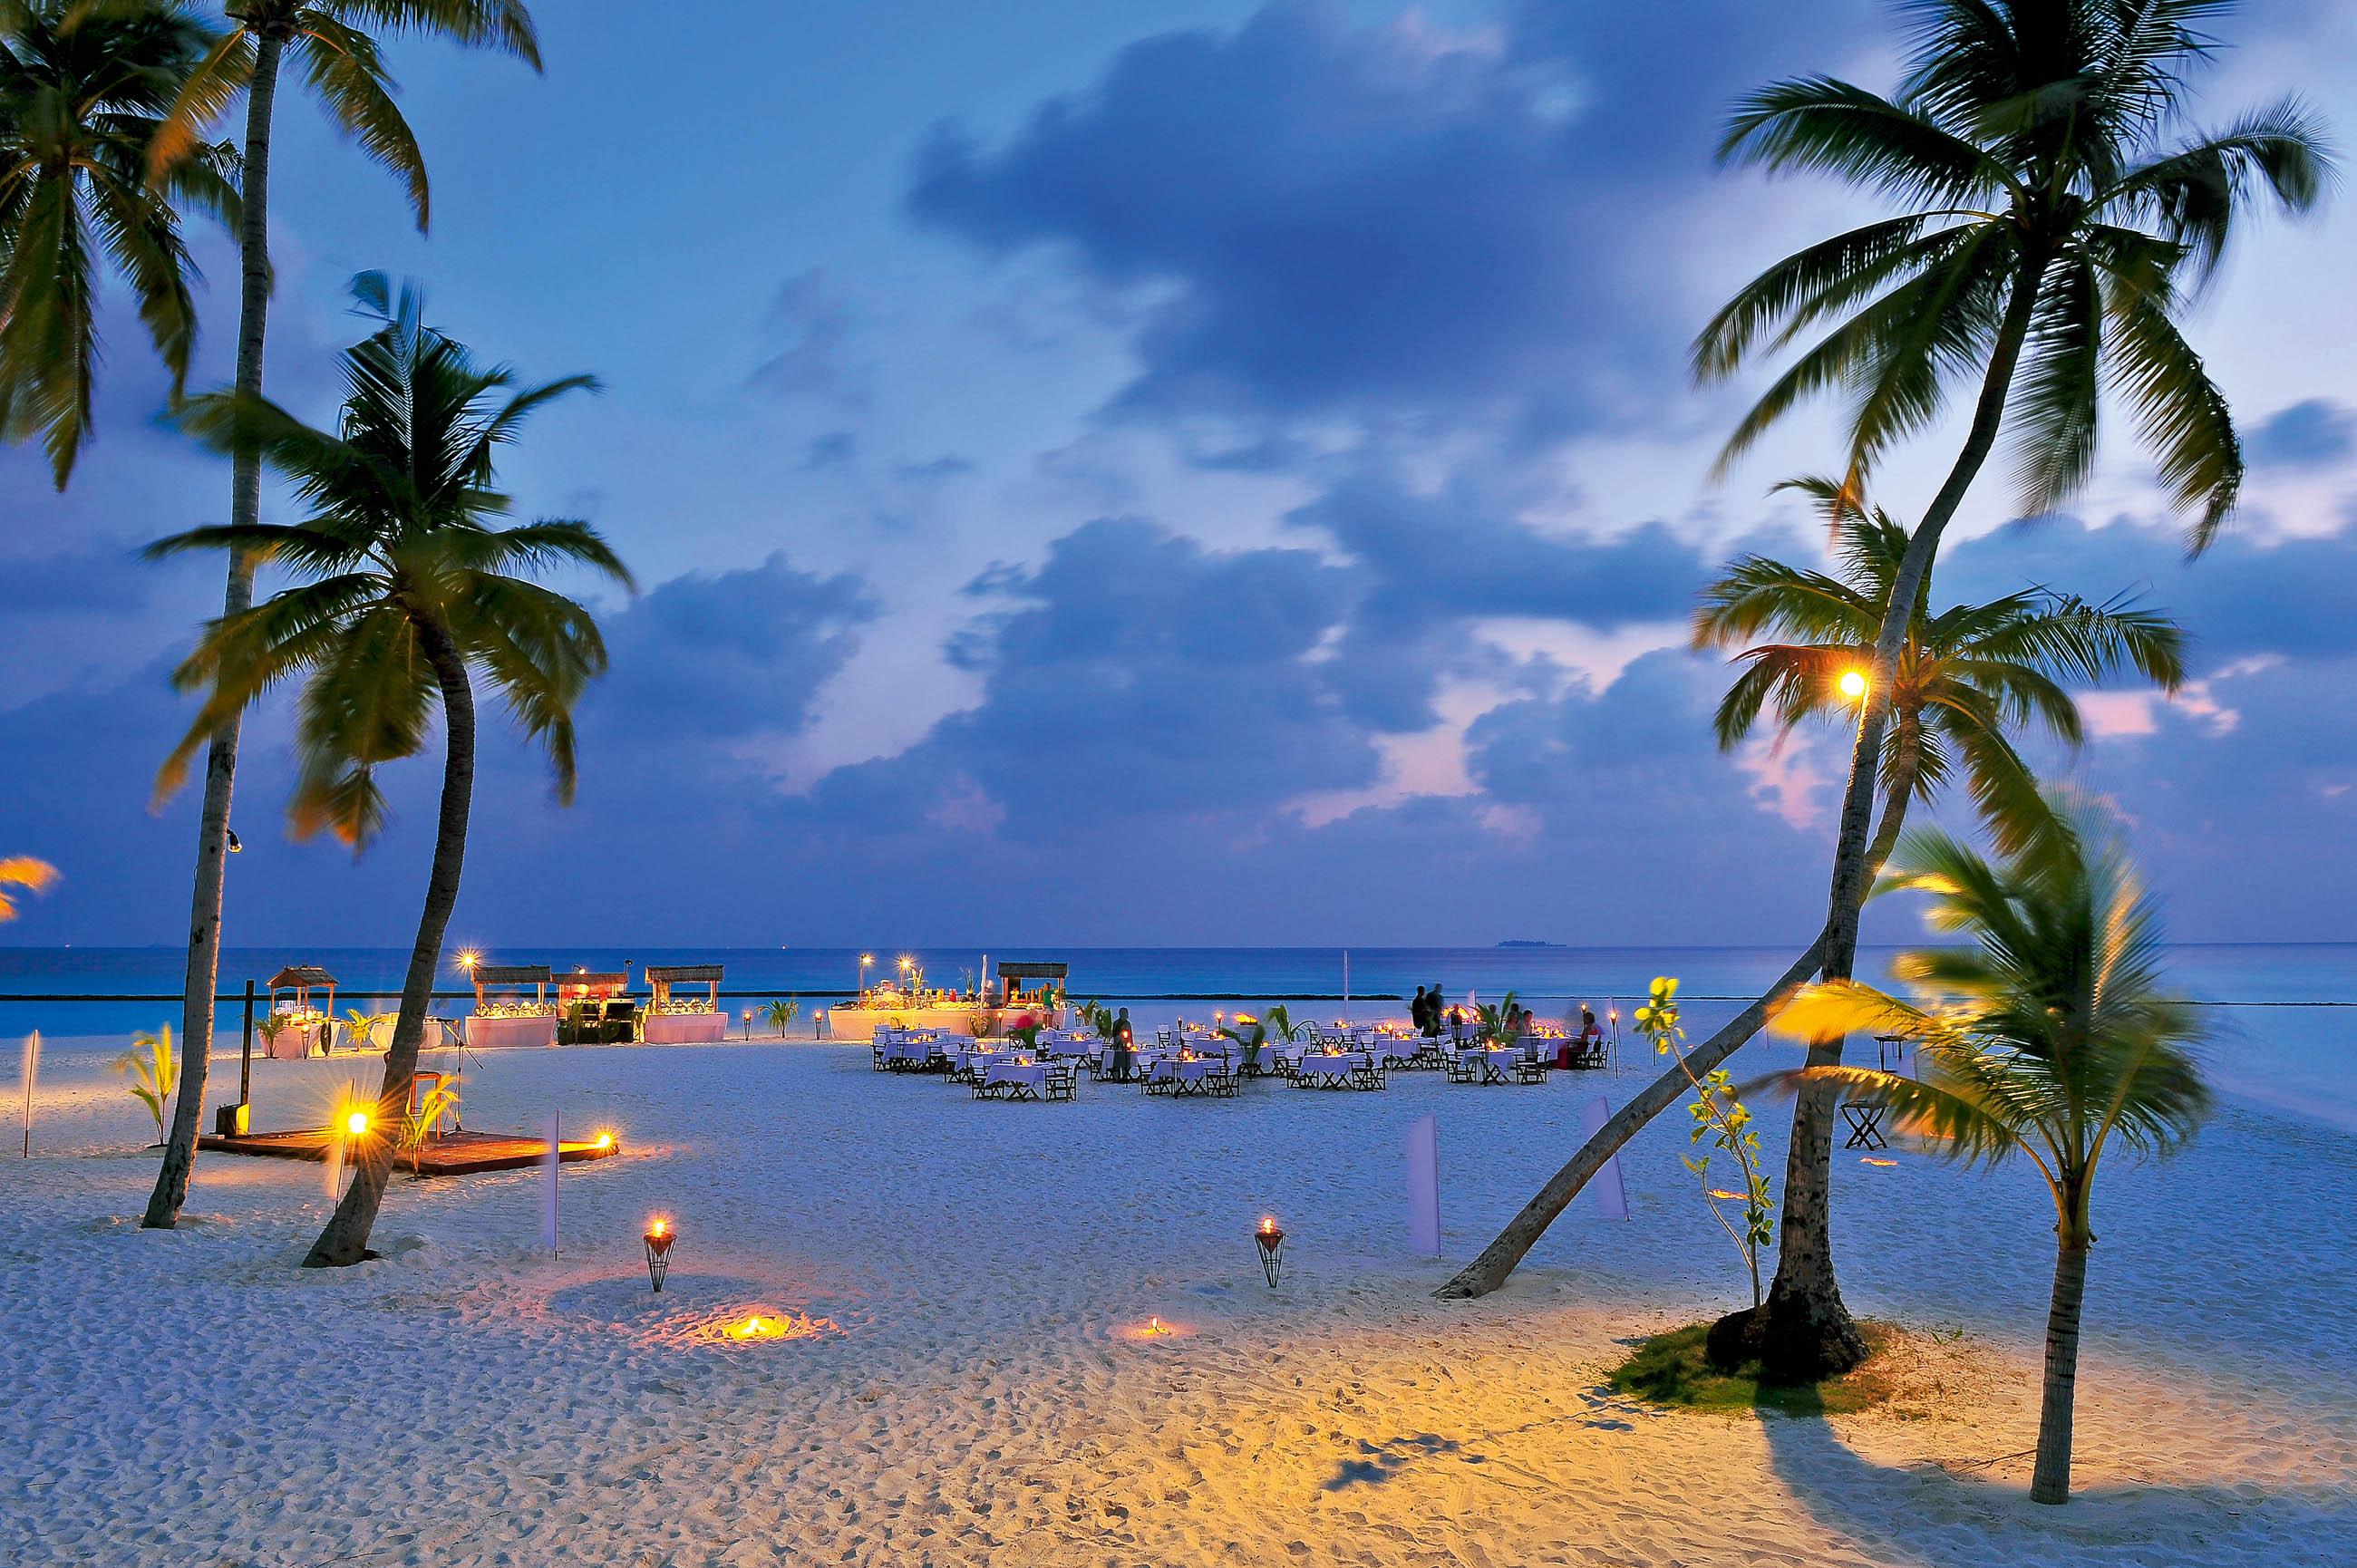 https://bubo.sk/uploads/galleries/16372/halaveli-maldives-meeru-beach-restaurant-buffet-1_hd-31.jpg